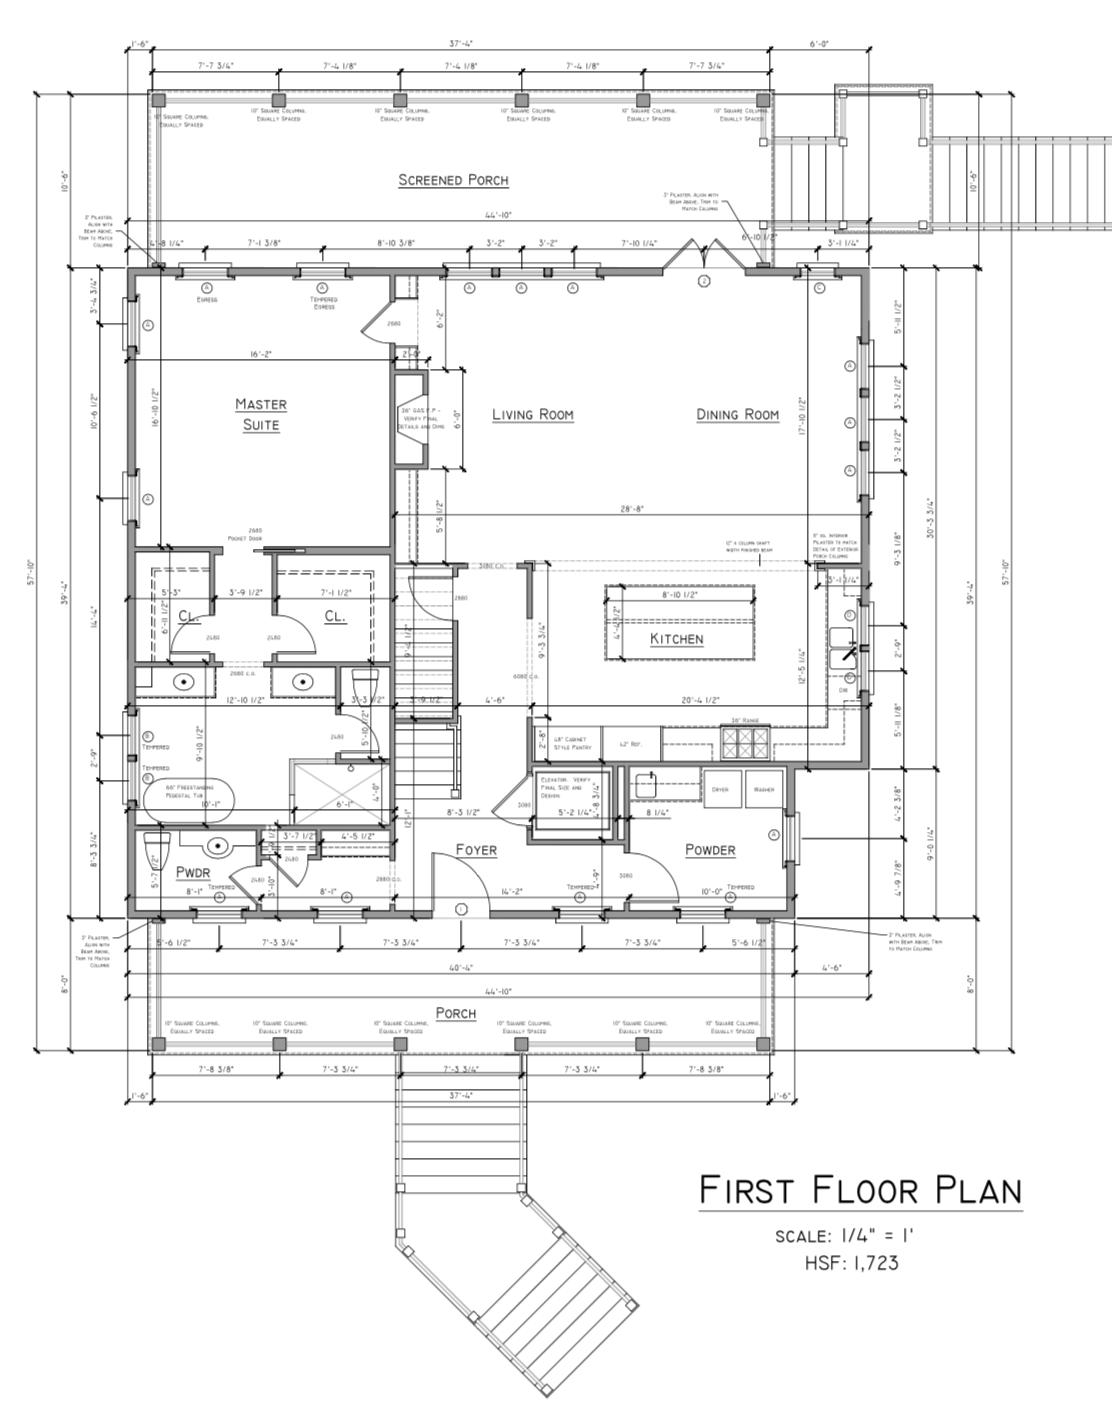 Hopkinson Plantation Homes For Sale - 3 Hopkinson Plantation, Johns Island, SC - 1